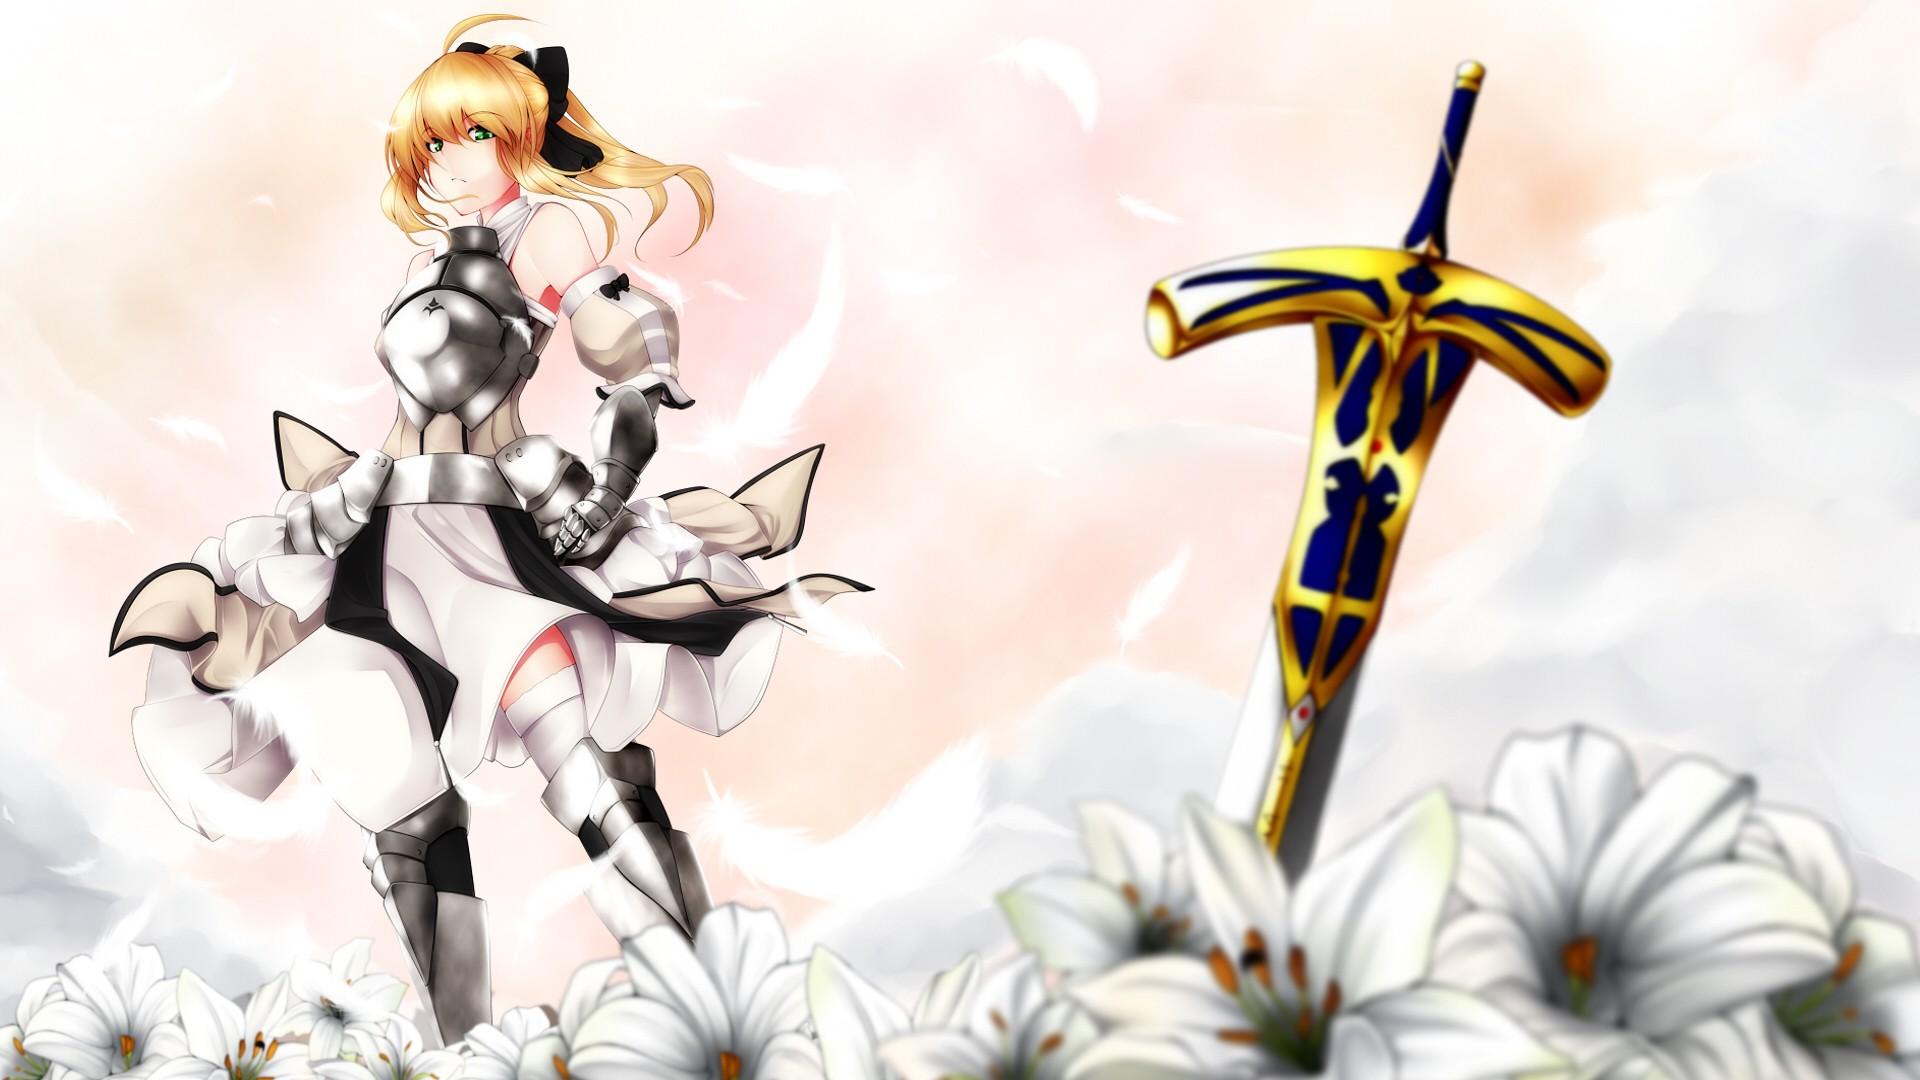 Wallpaper illustration anime cartoon fate series saber lily illustration anime cartoon saber fate series saber lily flower izmirmasajfo